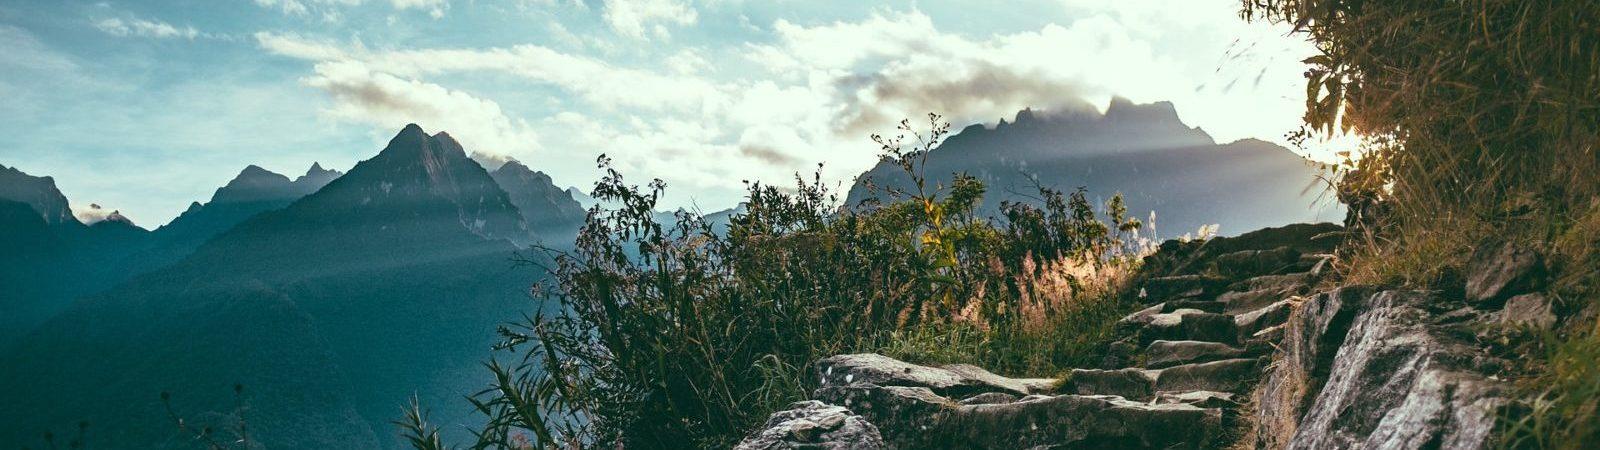 chemin montagnes